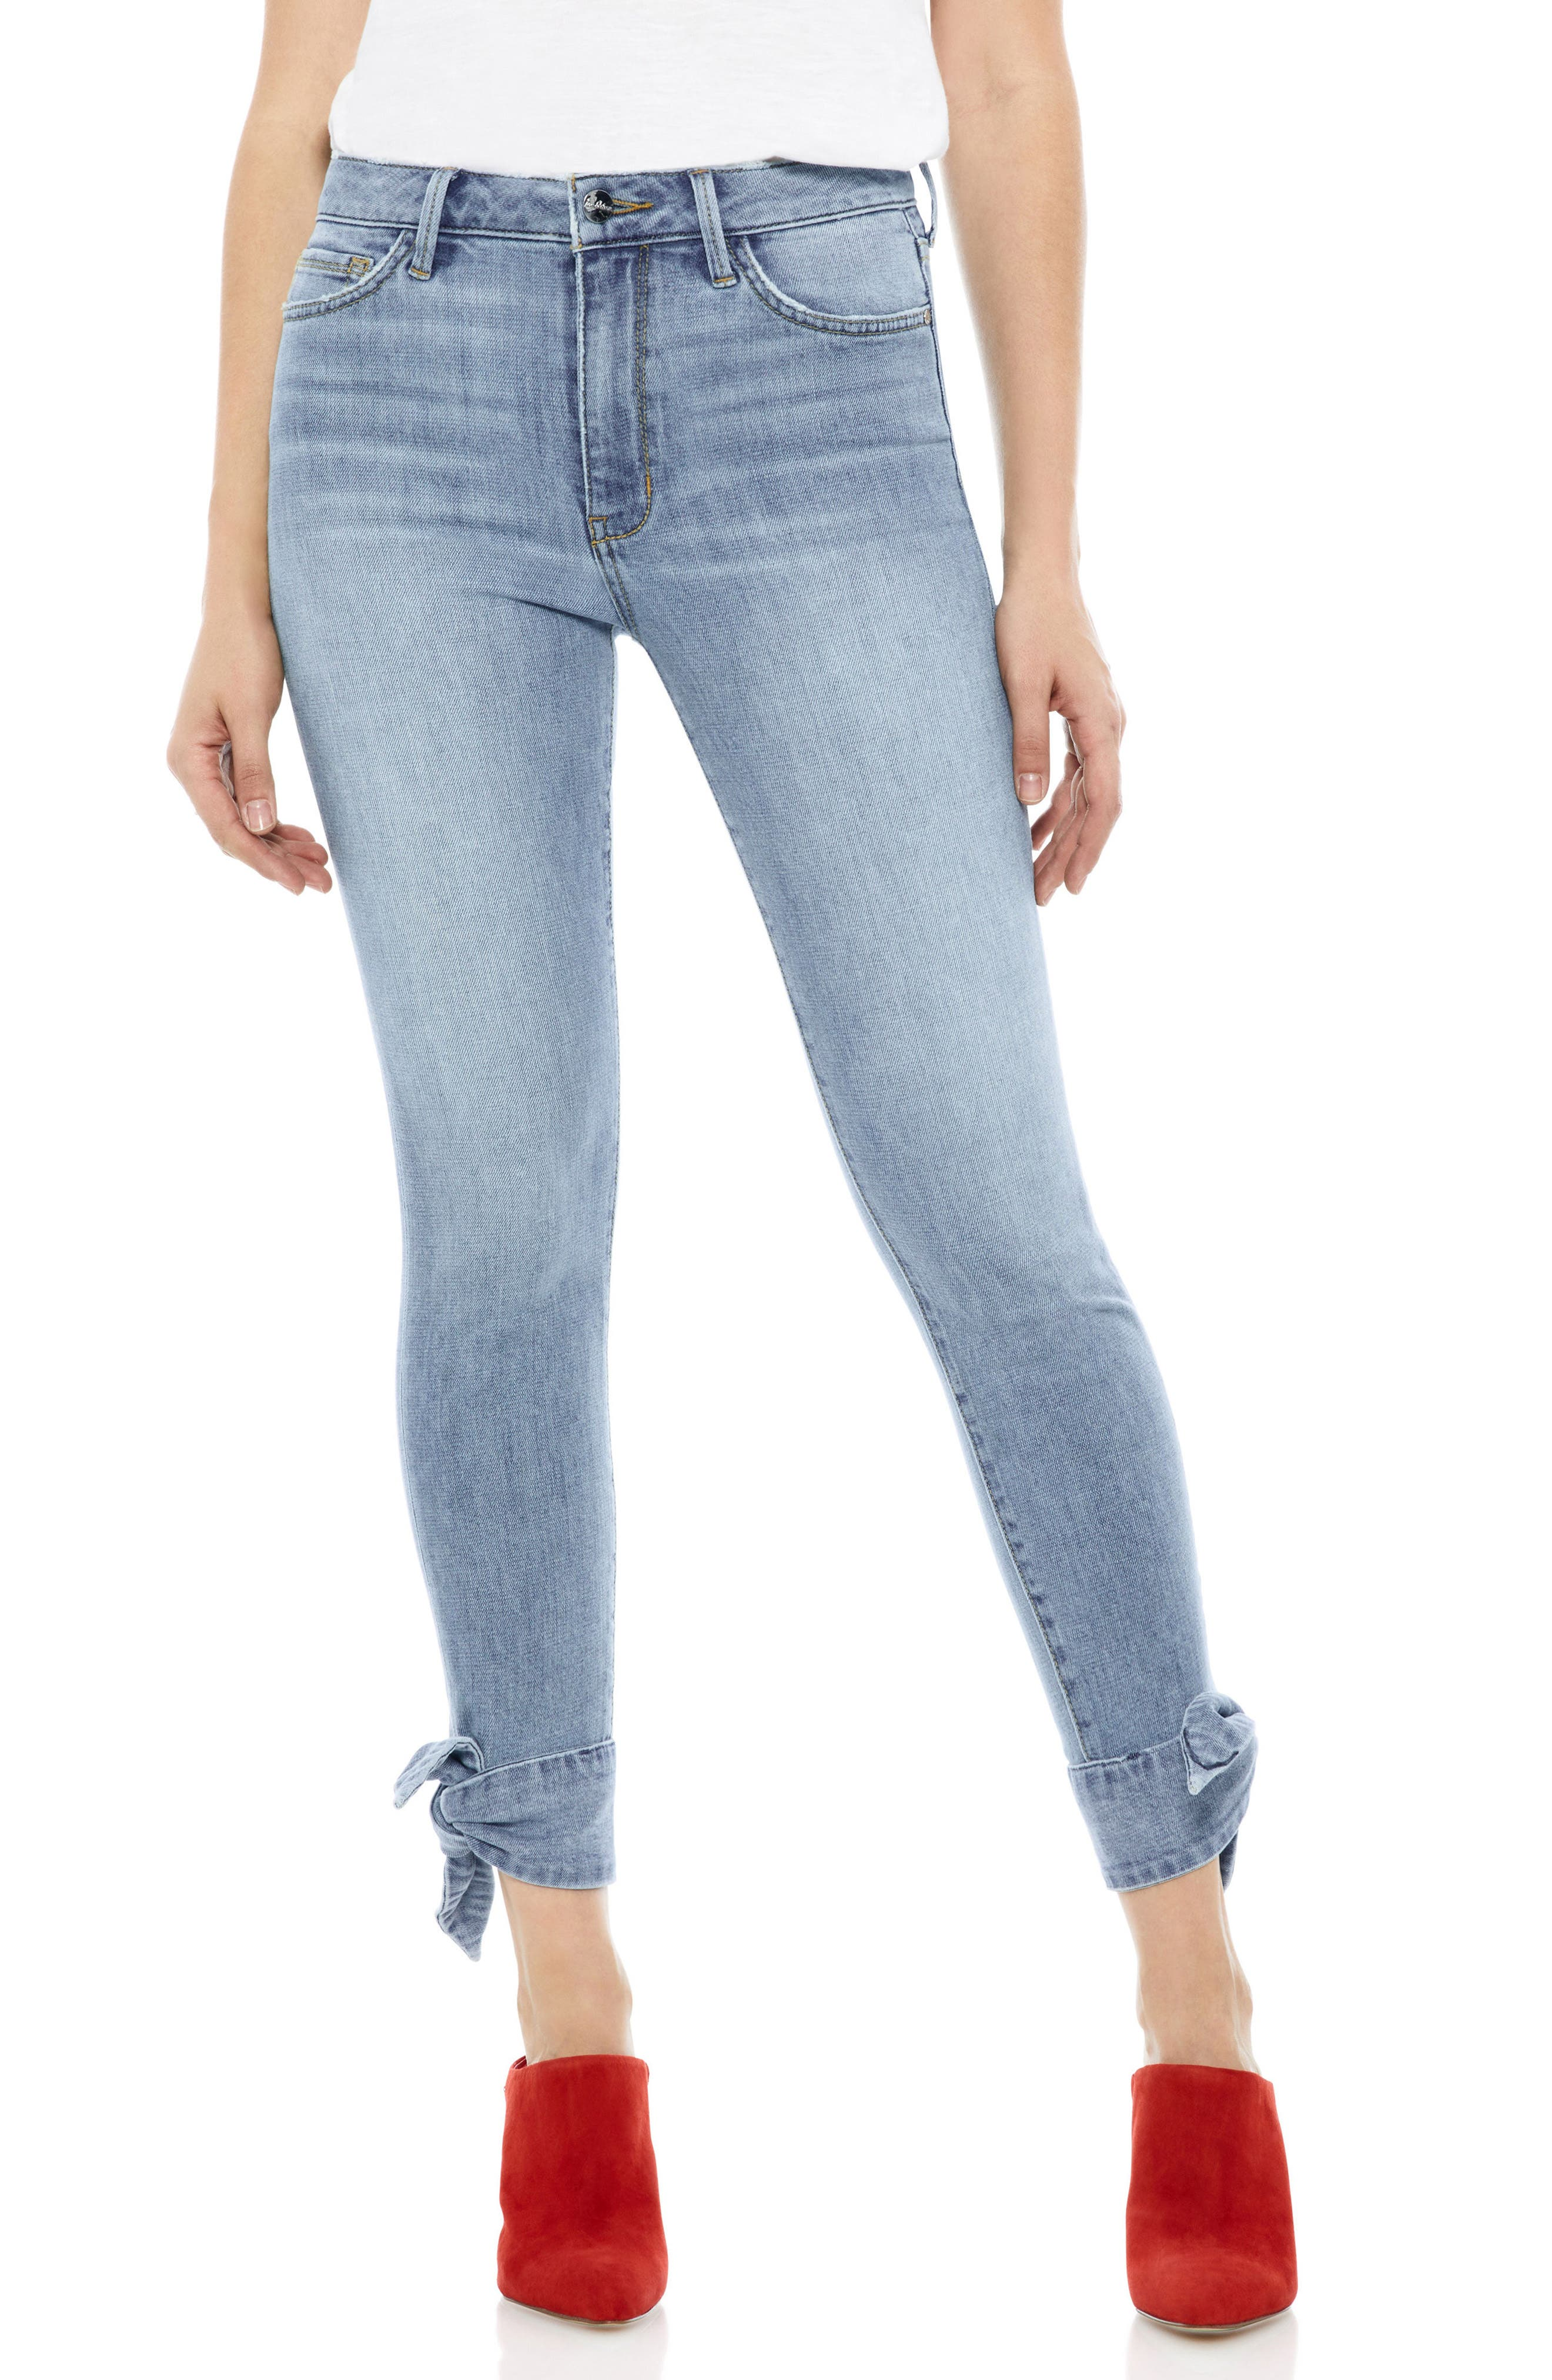 Sam Edelman The Stiletto Ankle Tie Jeans (Fannie)